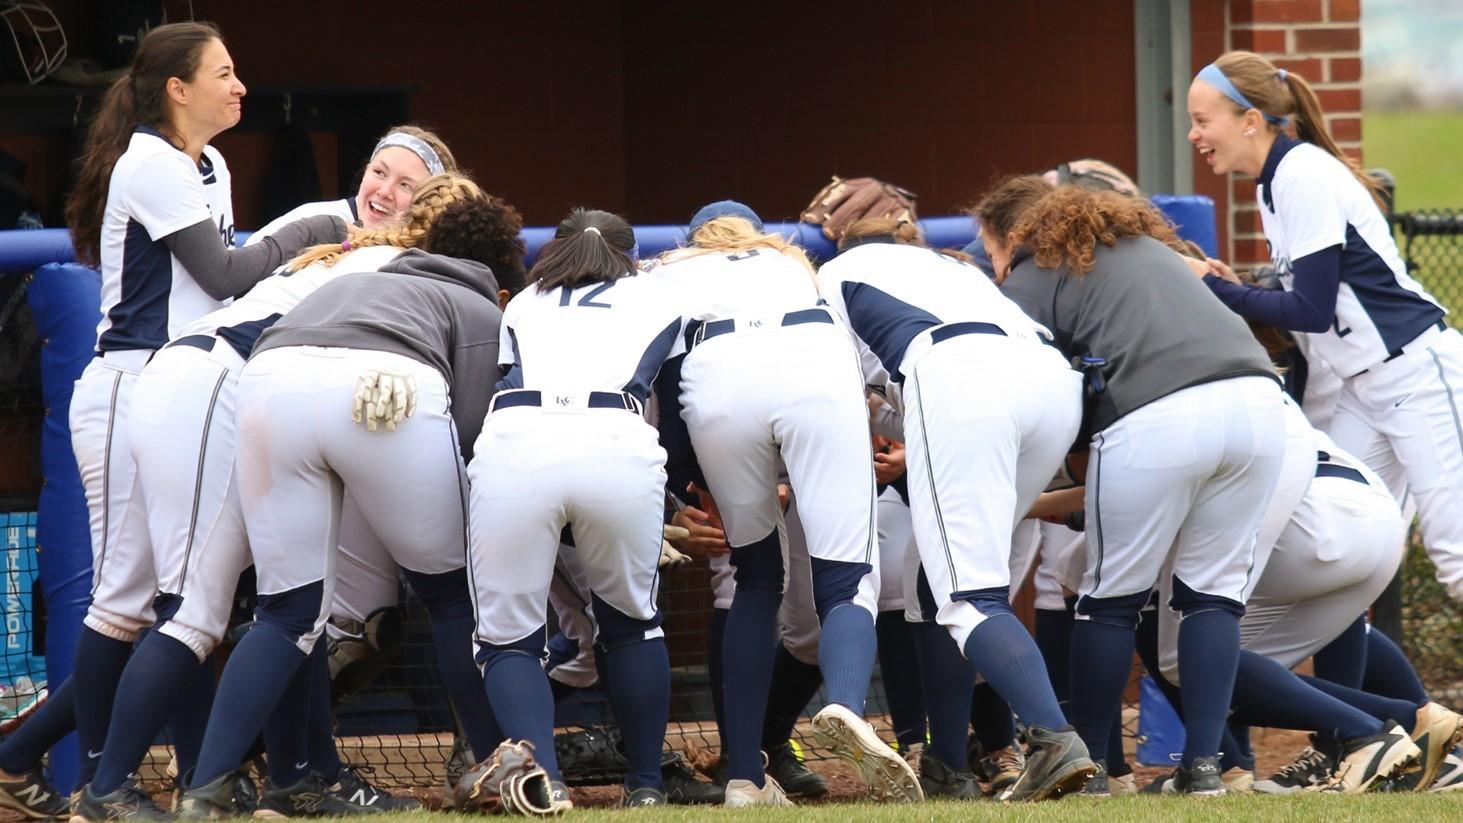 Softball pregame huddle